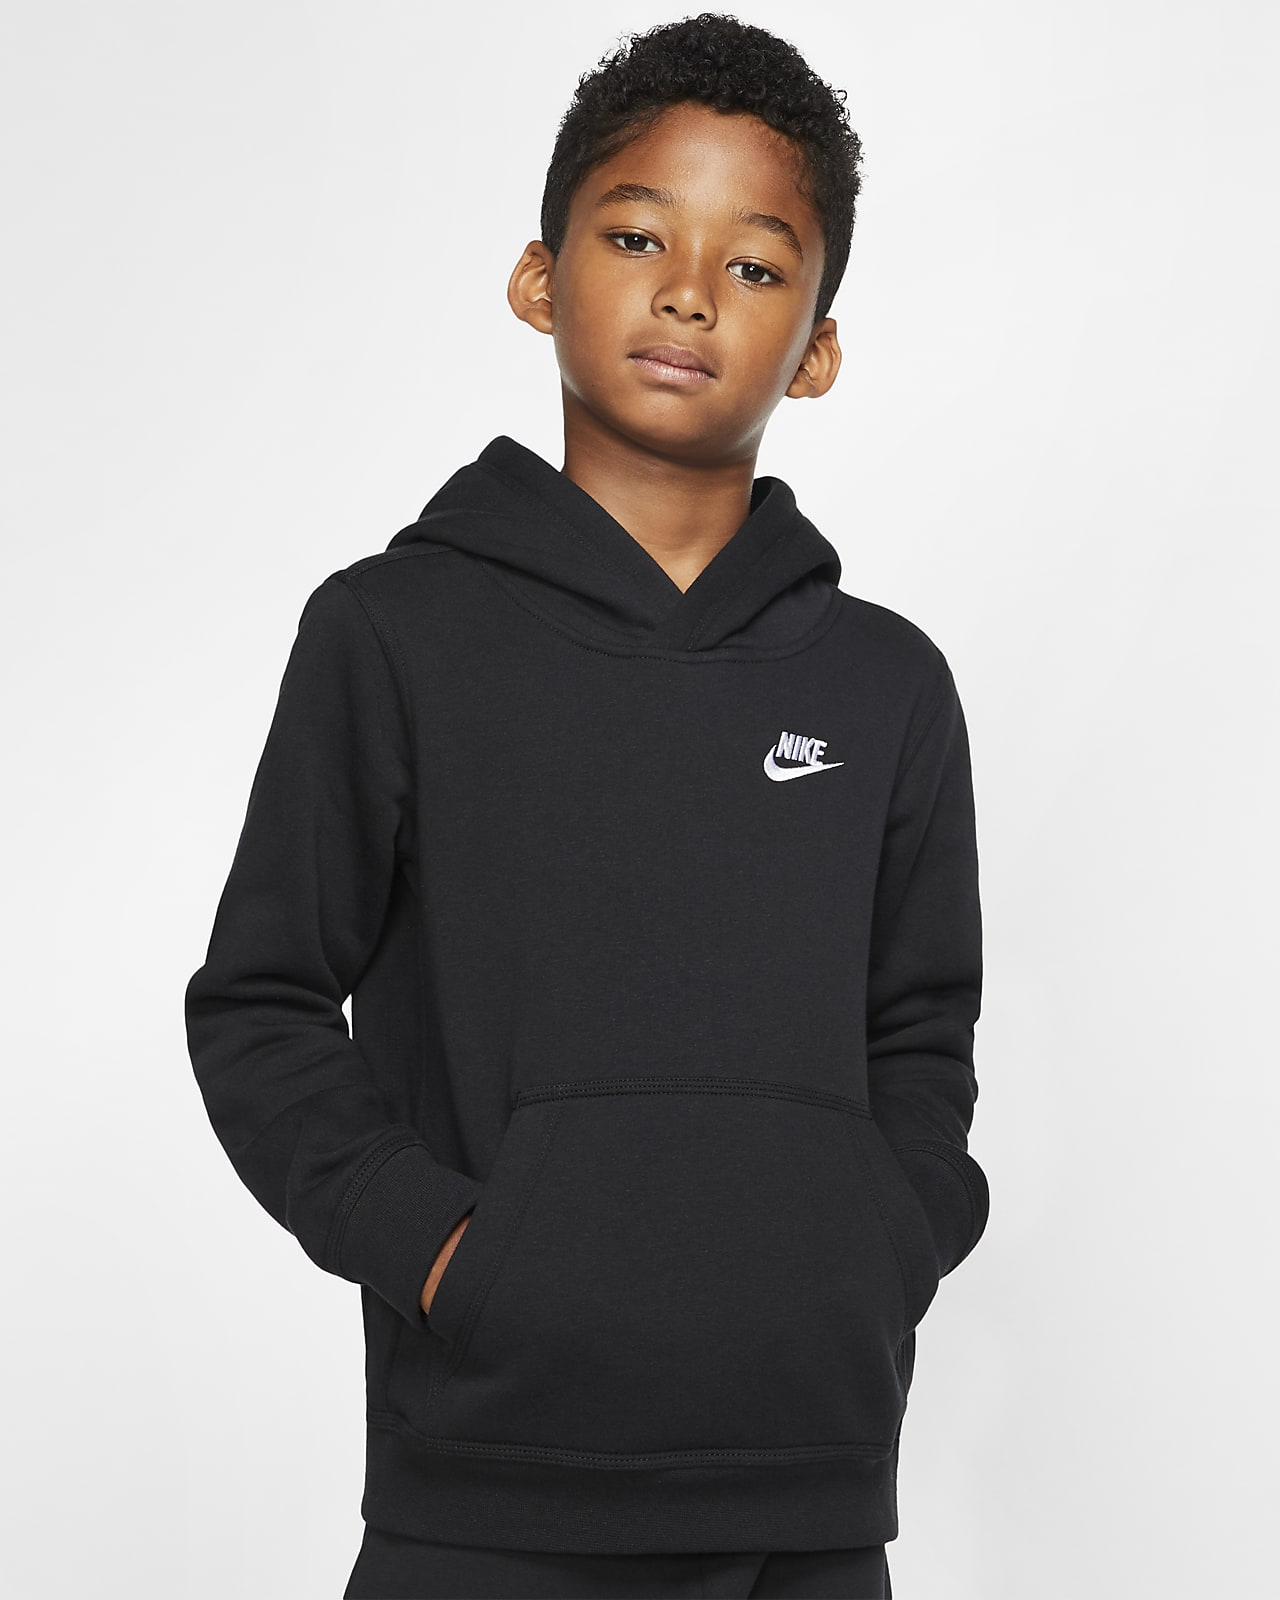 Hoodie pullover Nike Sportswear Club Júnior